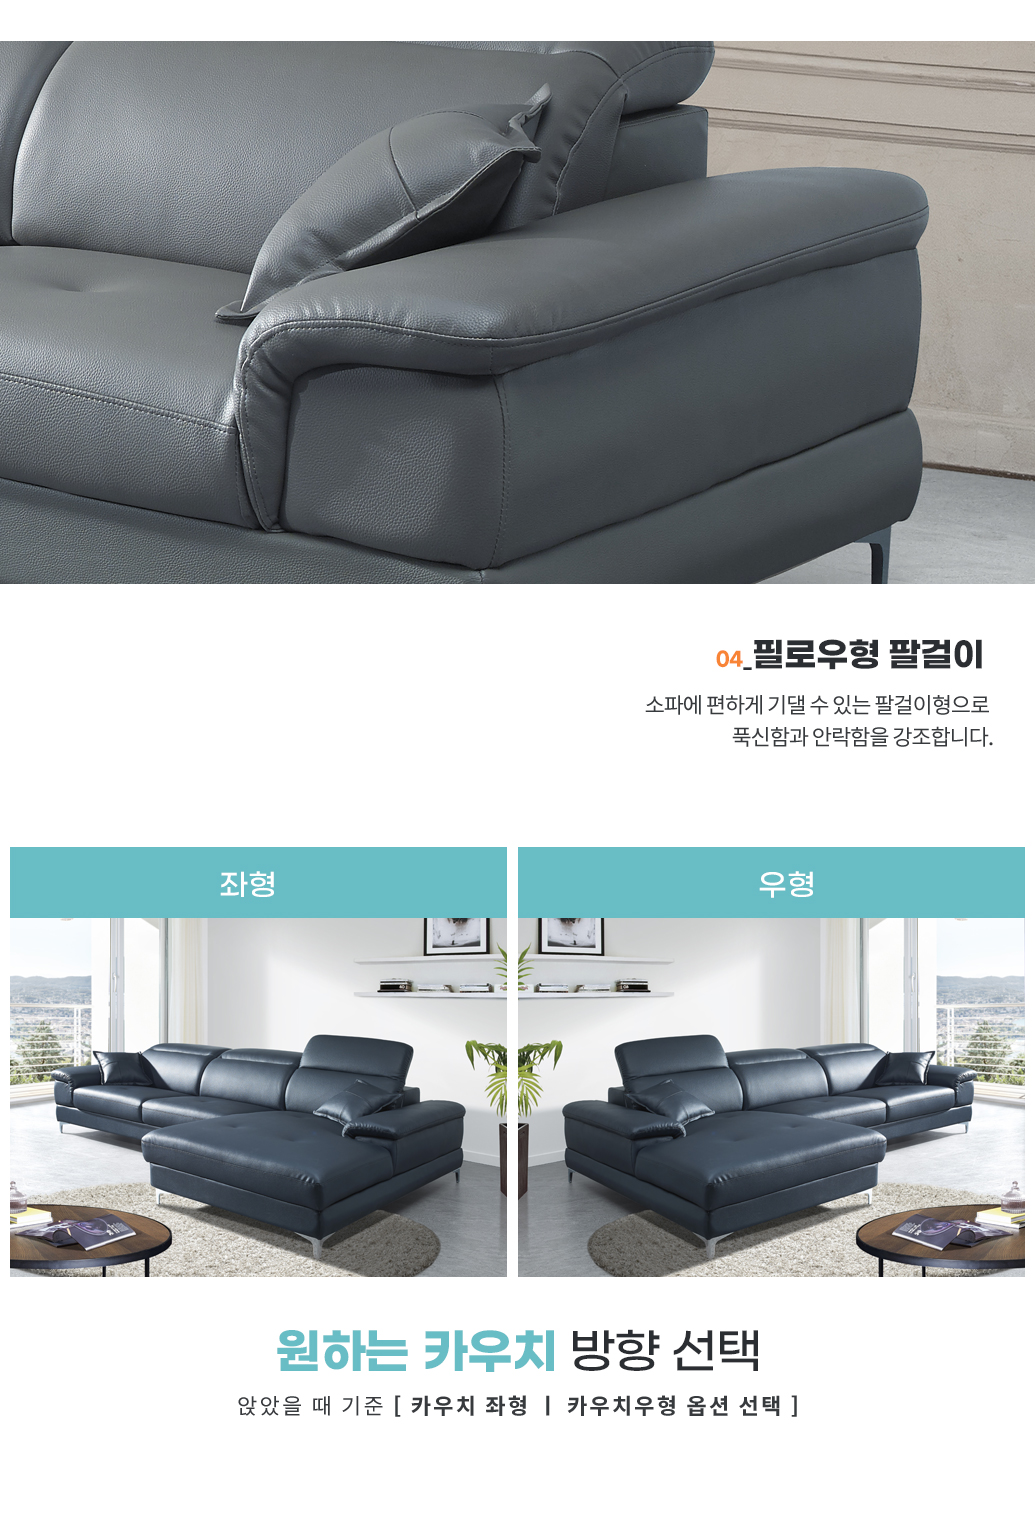 Gyua_couch_04.jpg